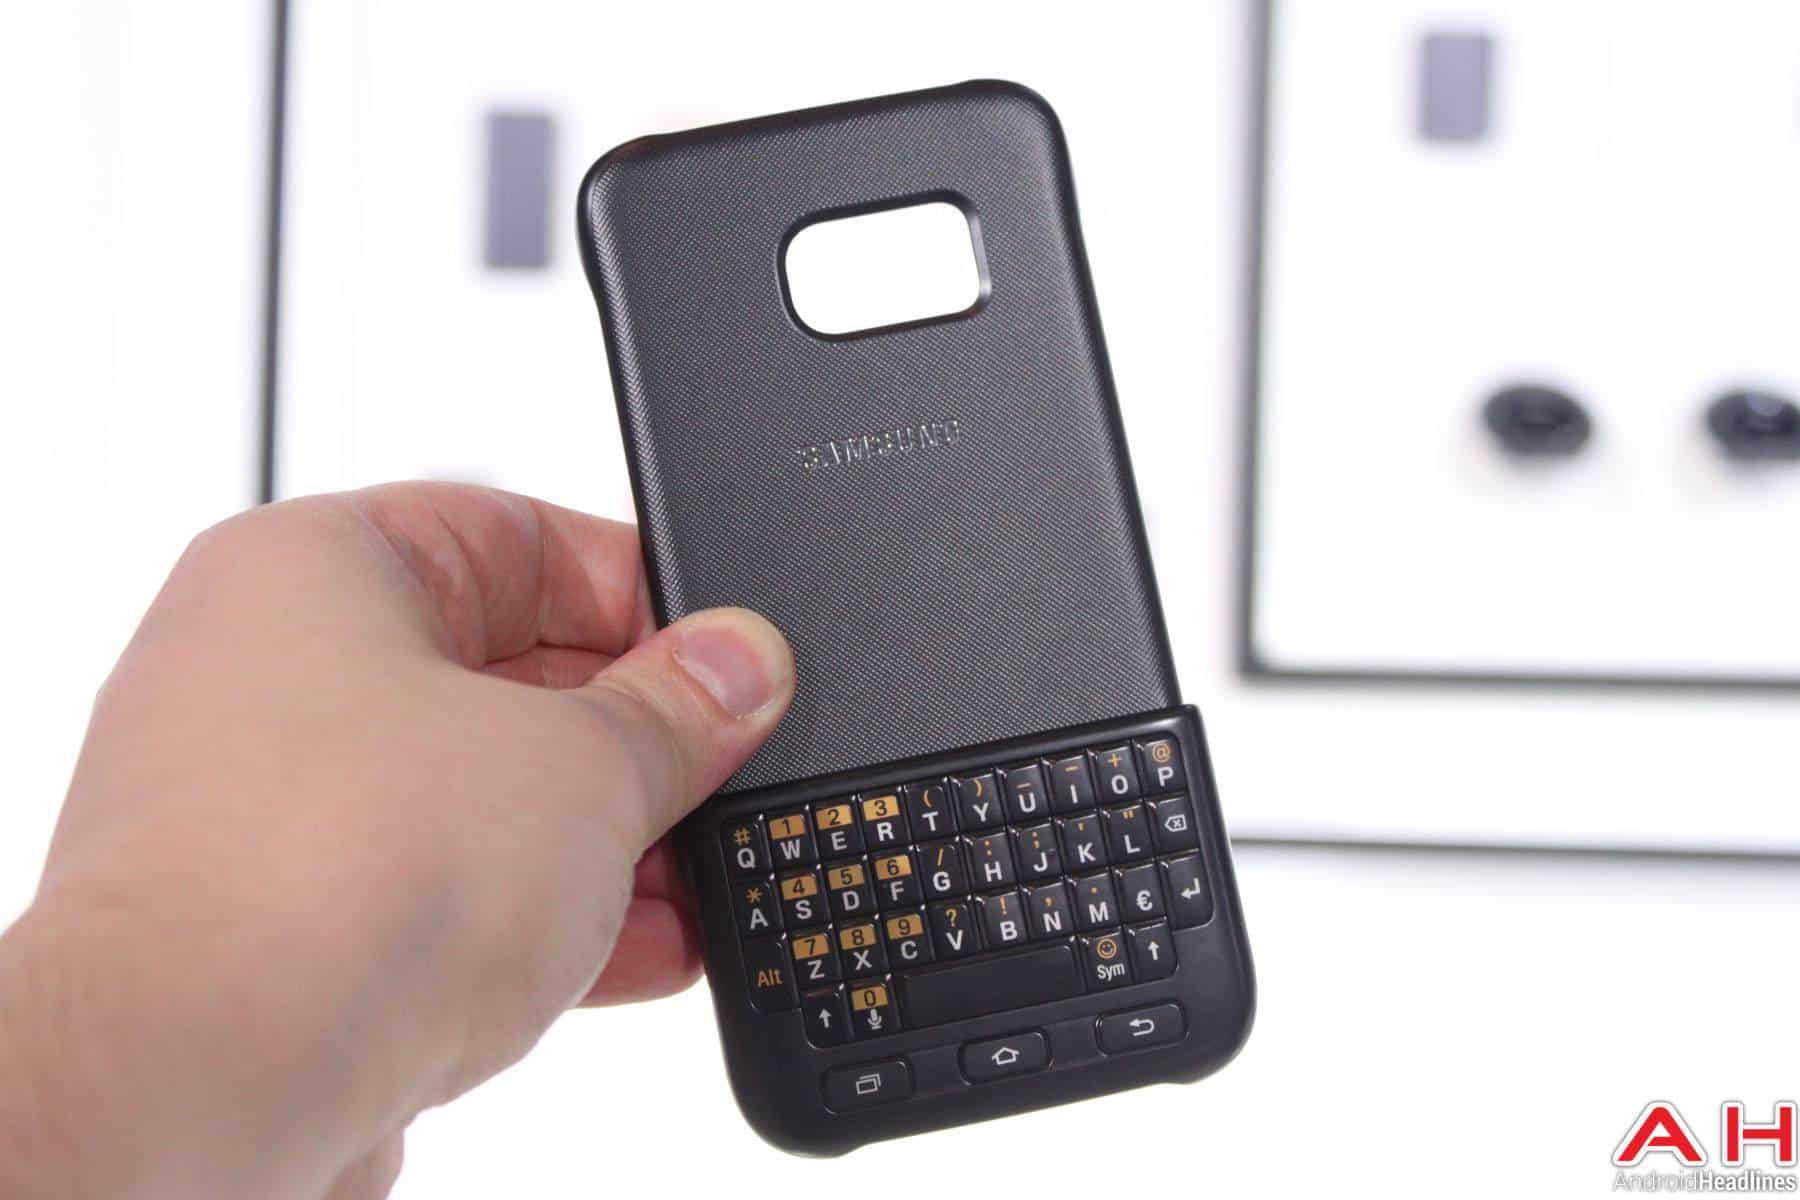 Samsung Galaxy S7 QWERTY Keyboard Cover AH 2